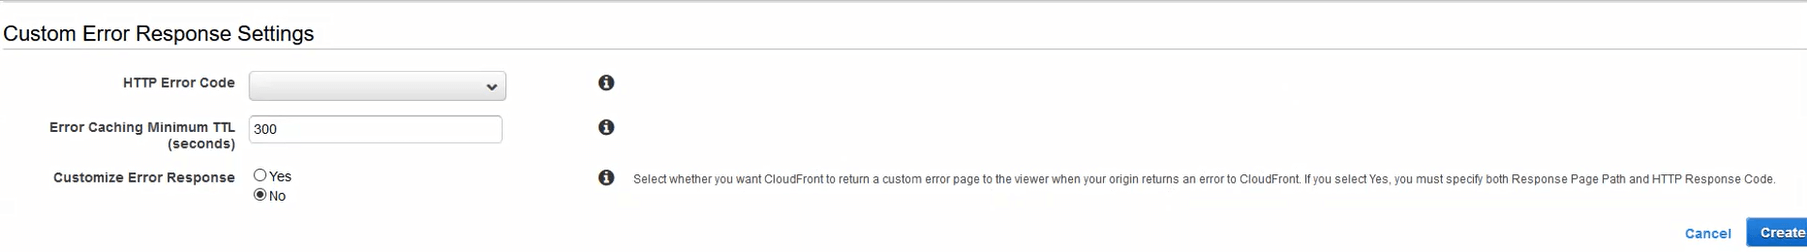 Creating a new custom error response